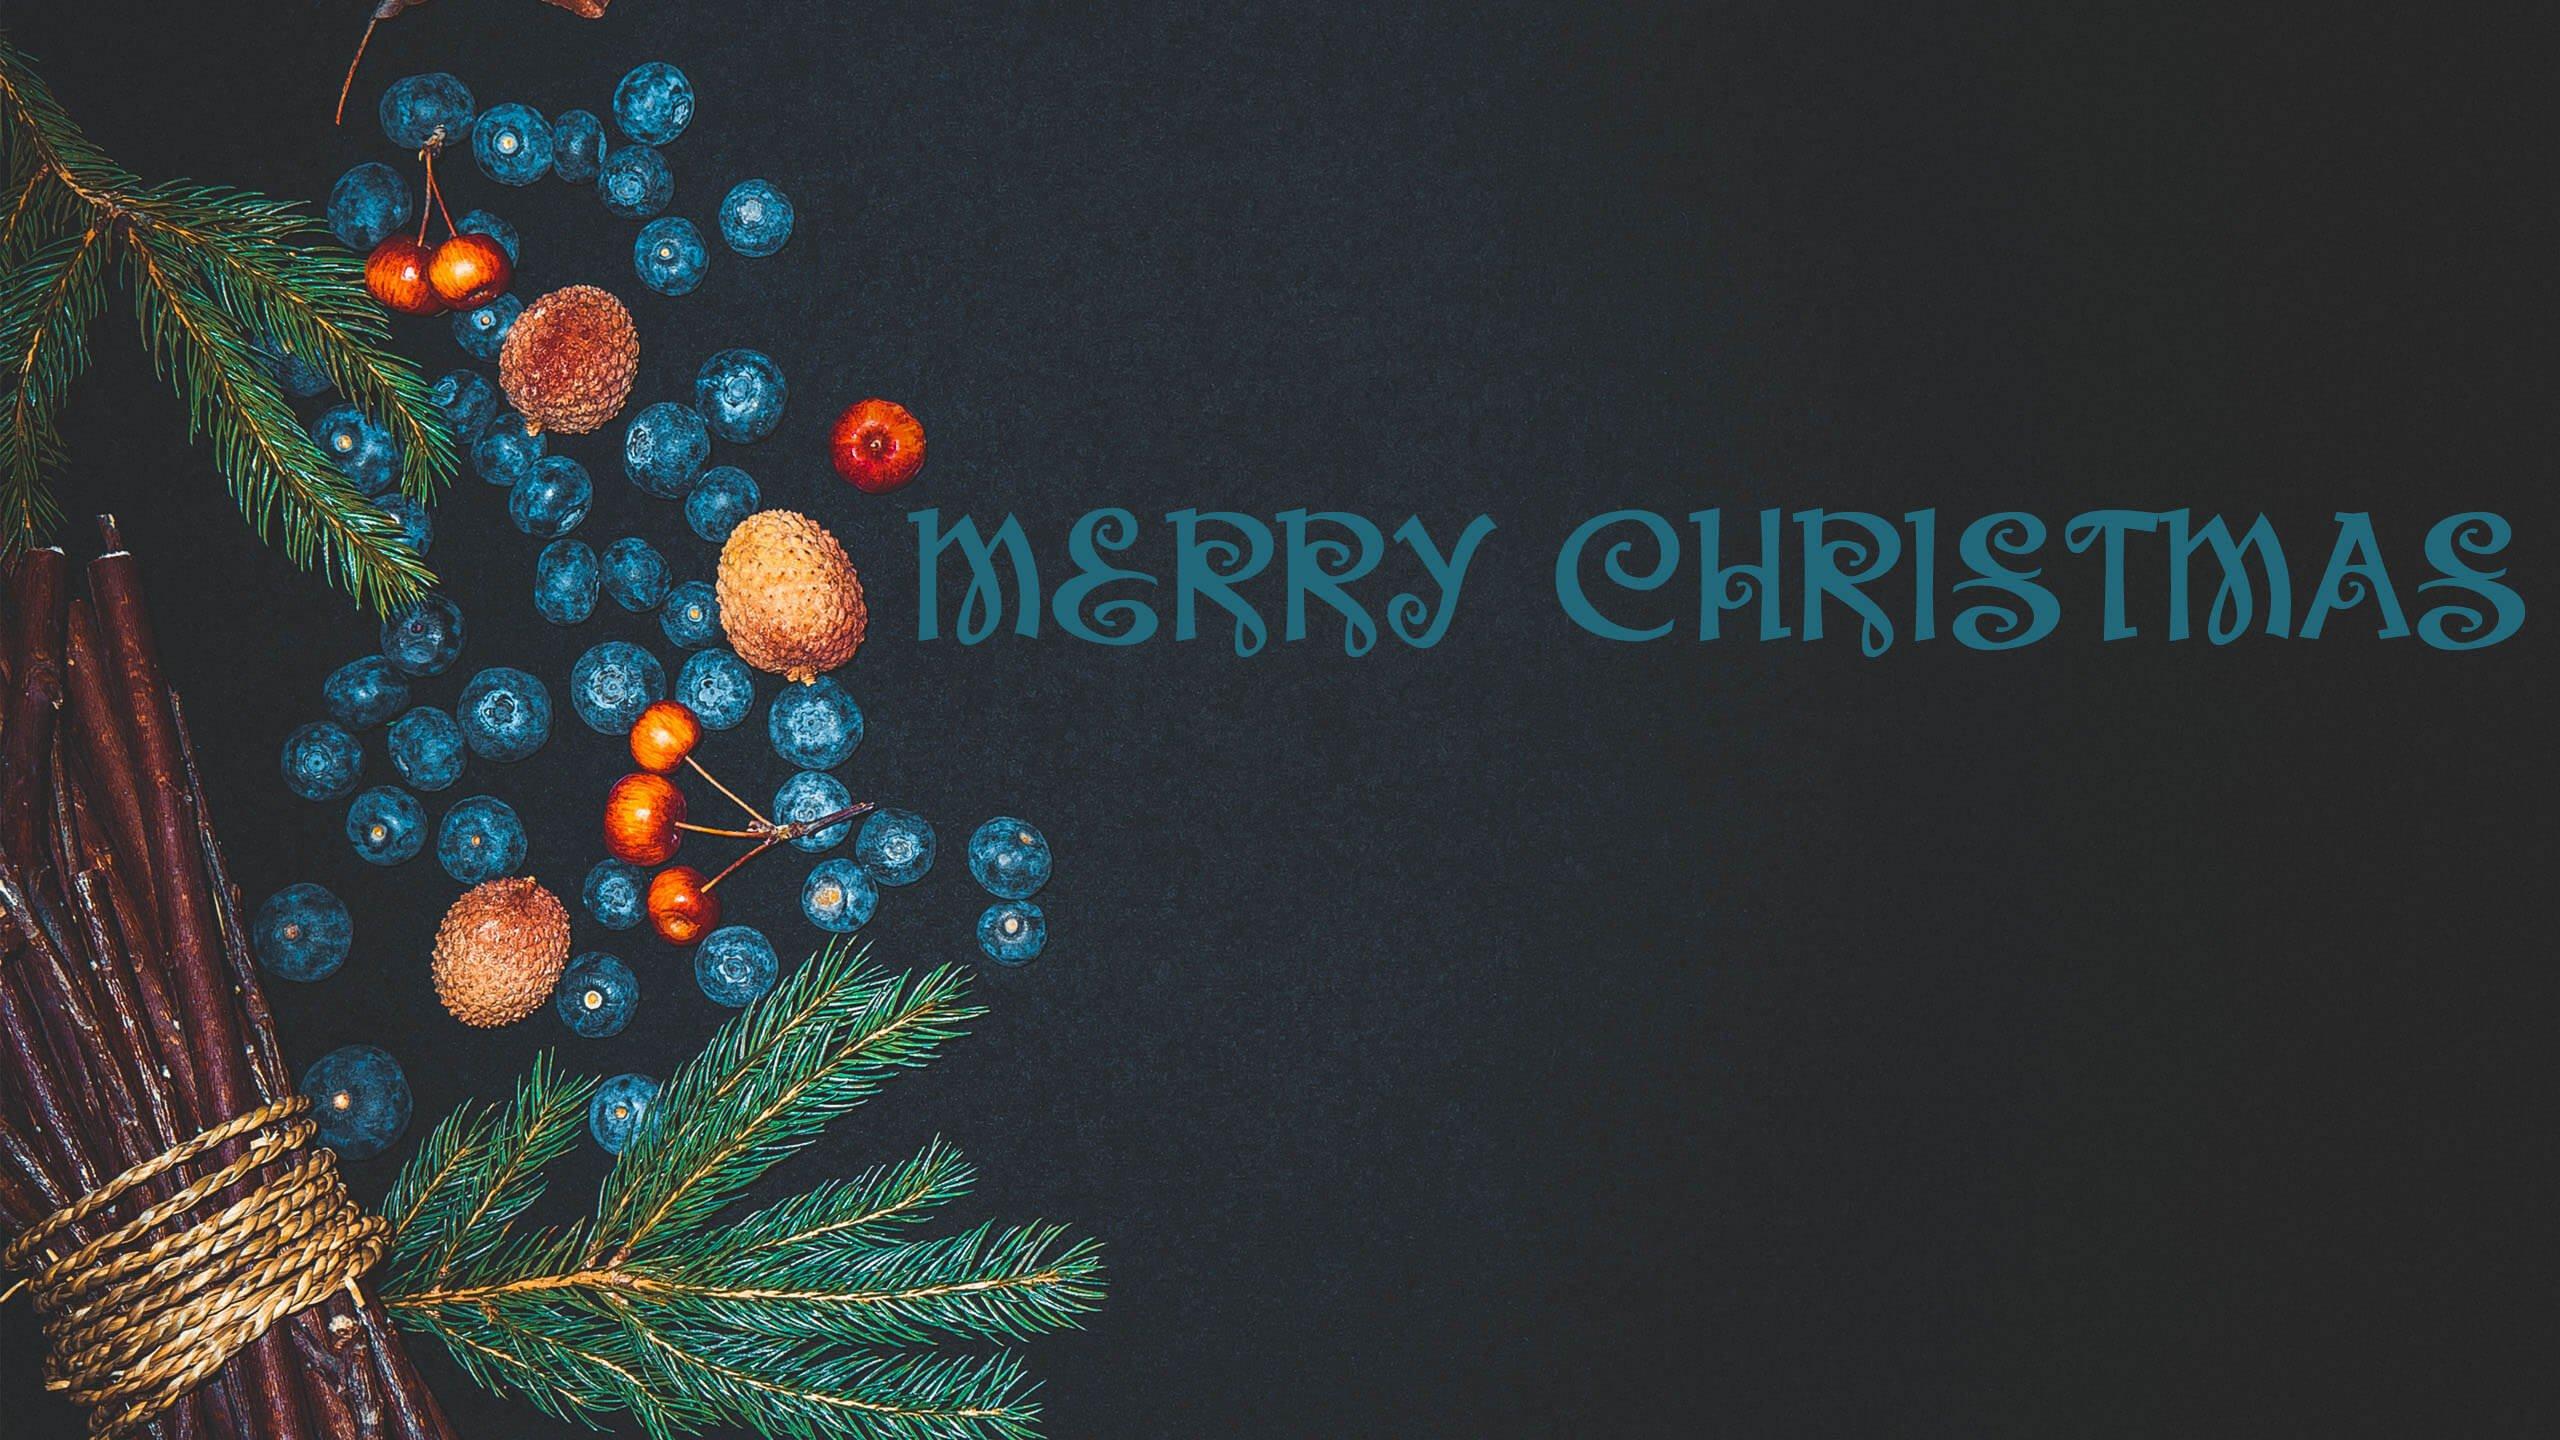 merry christmas hd wallpaper 2014